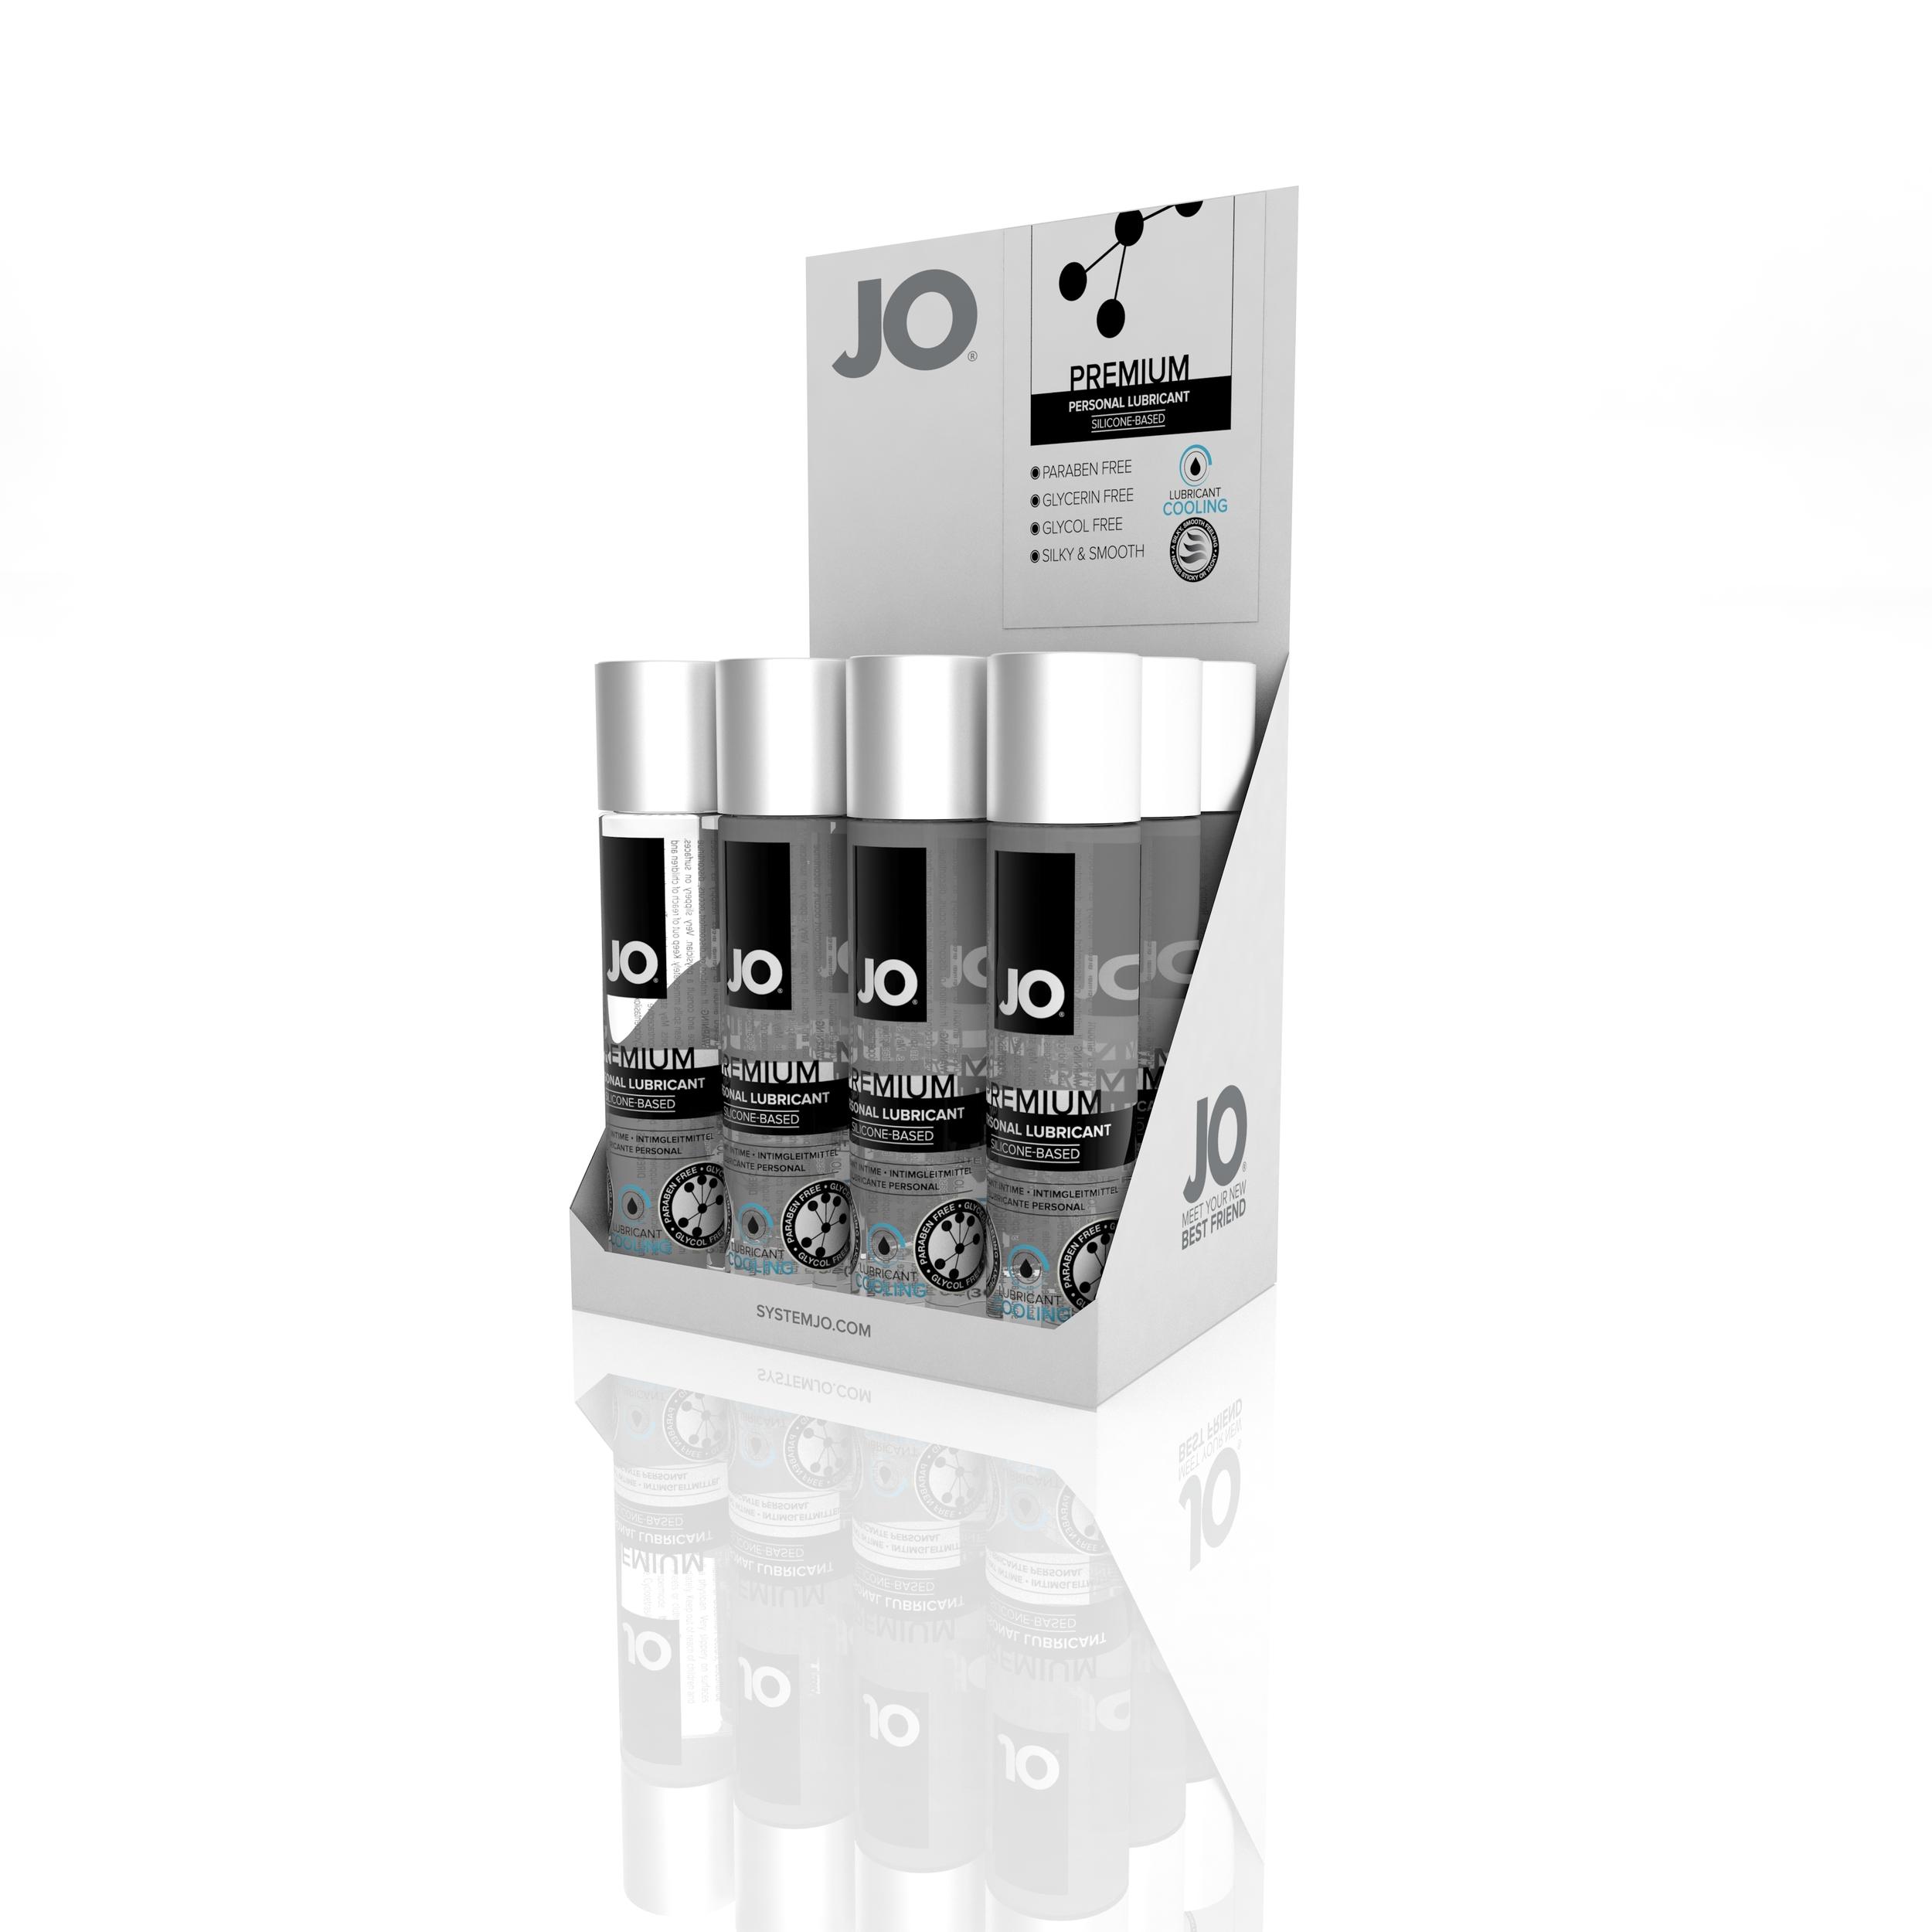 10231 - JO PREMIUM LUBRICANT - COOLING - 1fl.oz 30mL (MOQ 12 units - Includes Counter Display).jpg